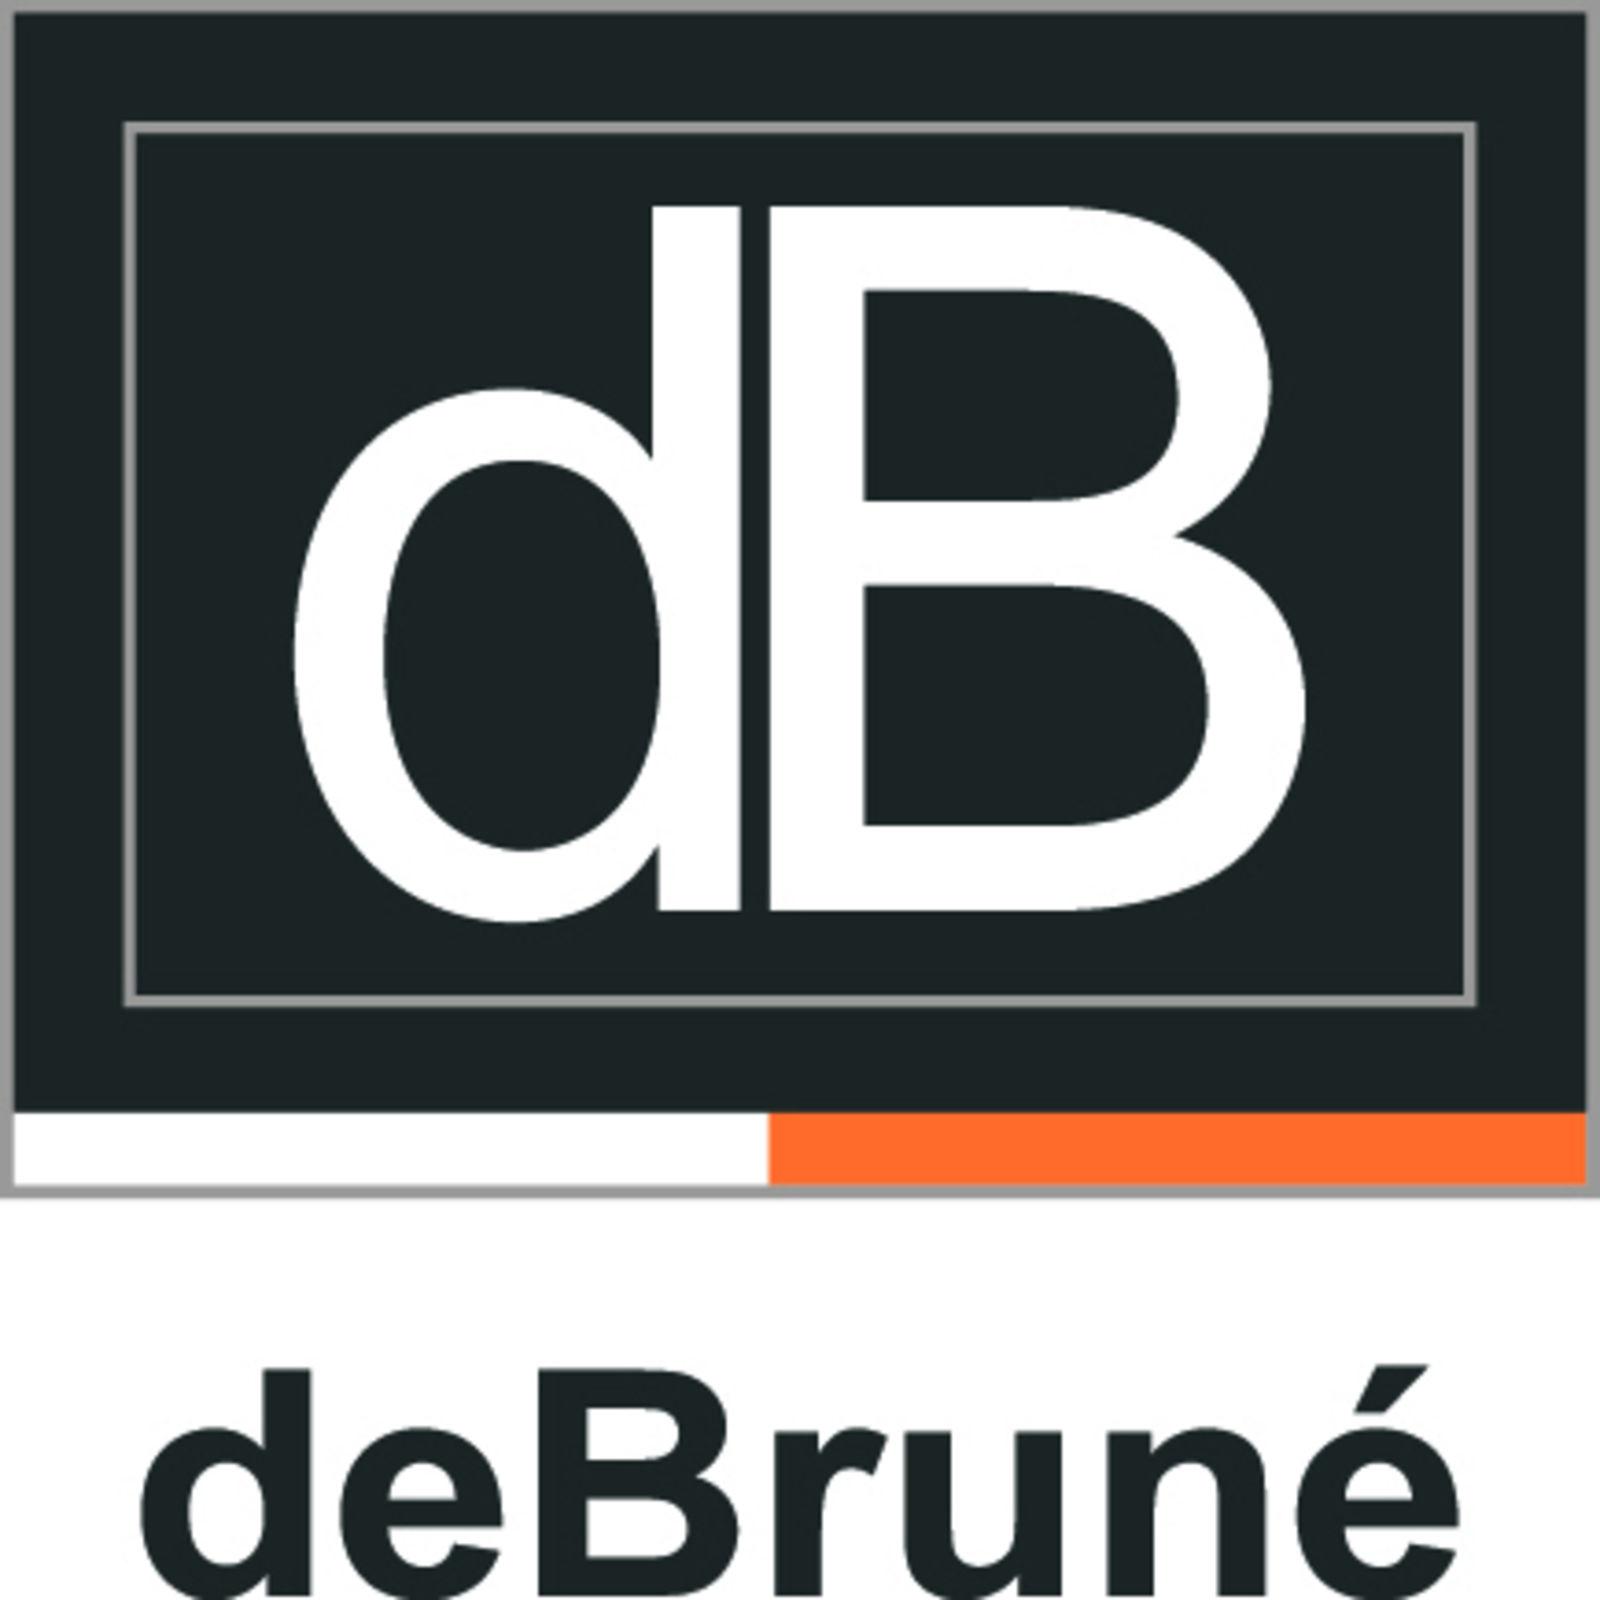 deBruné (Bild 1)